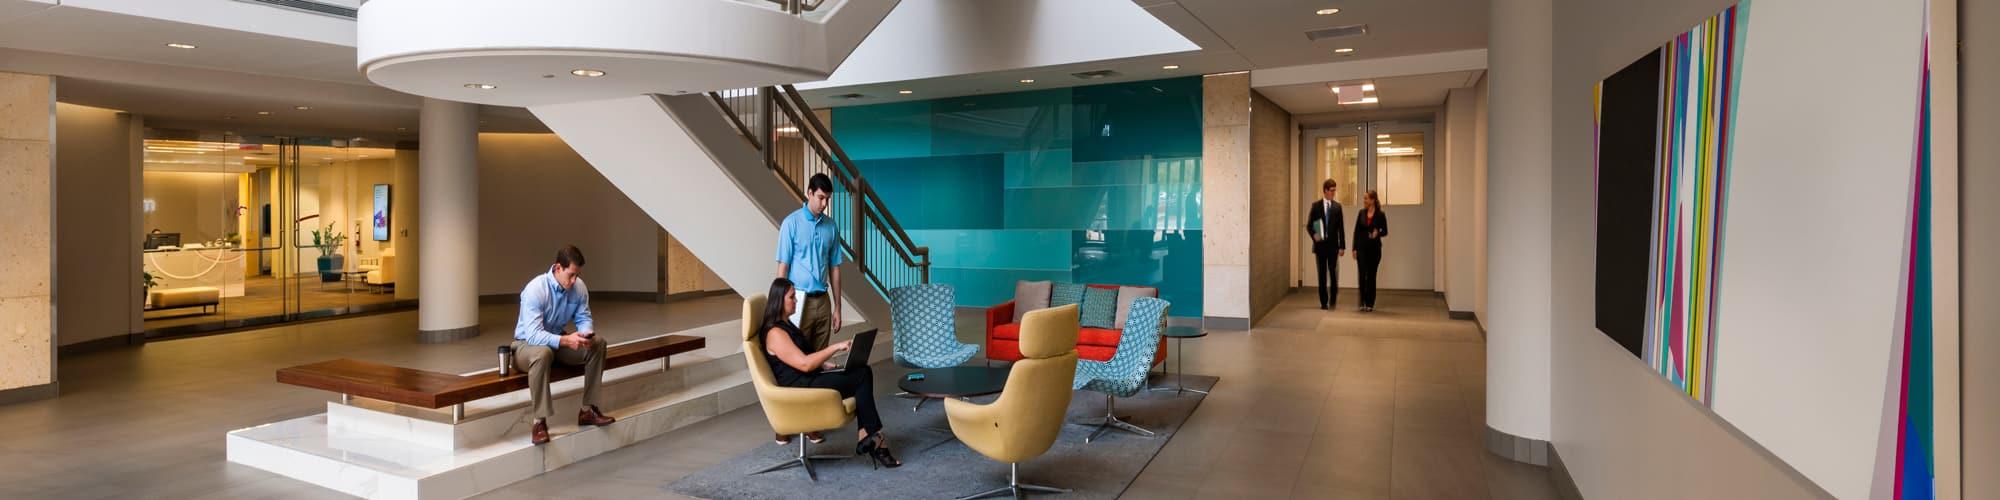 7700 Parmer Interior | 7700 Parmer Lane in Austin, Texas